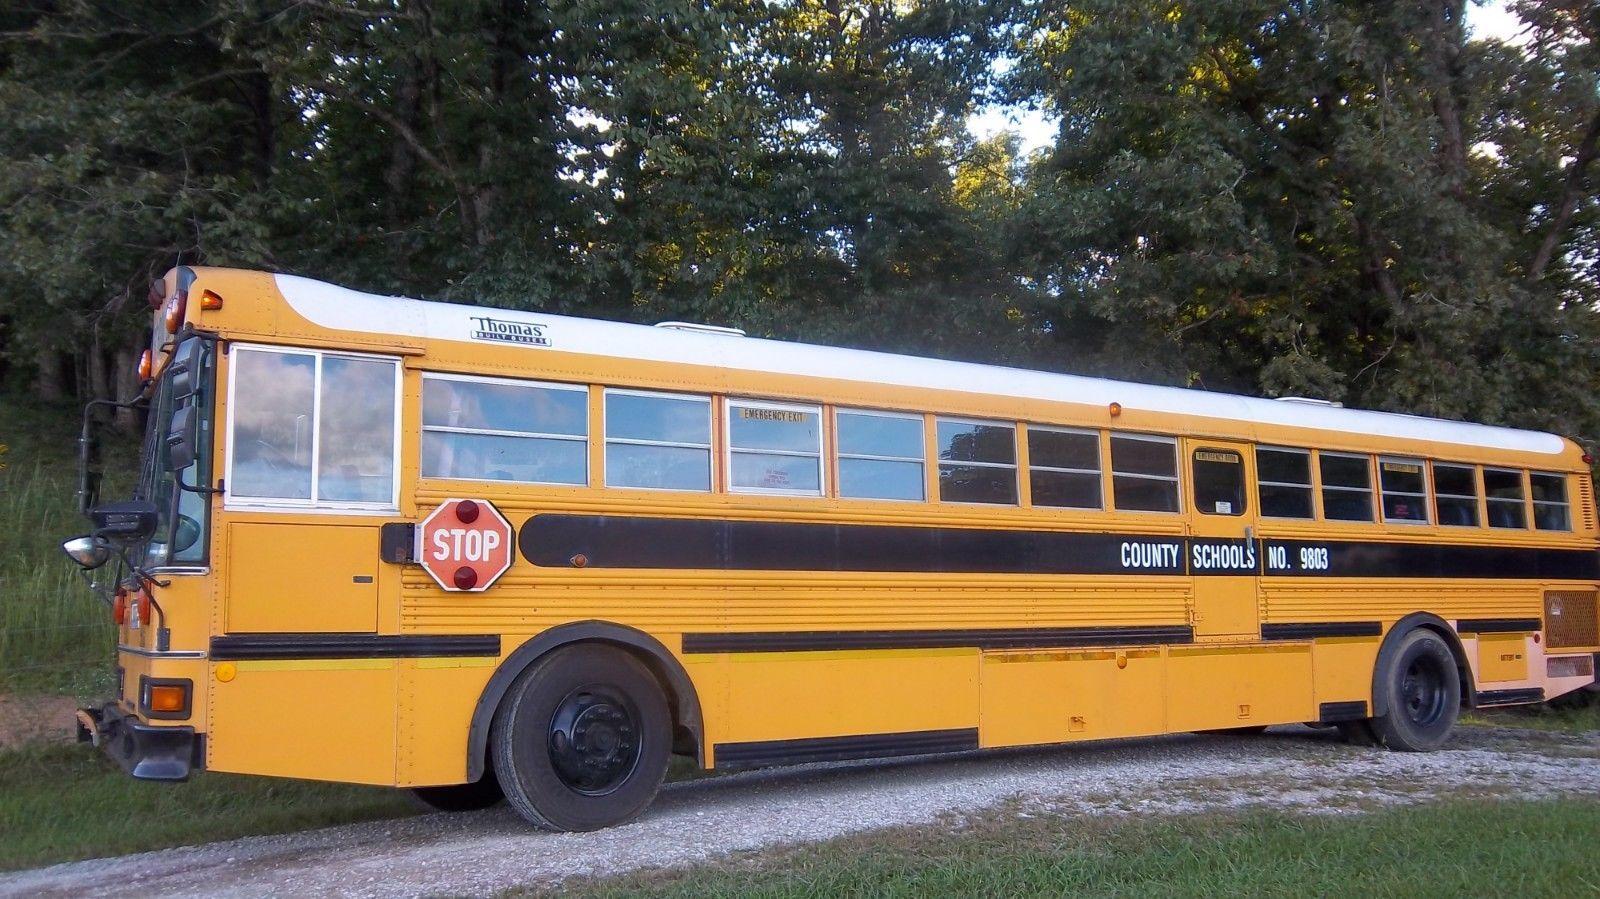 1999 Thomas Saf T Liner School bus for sale